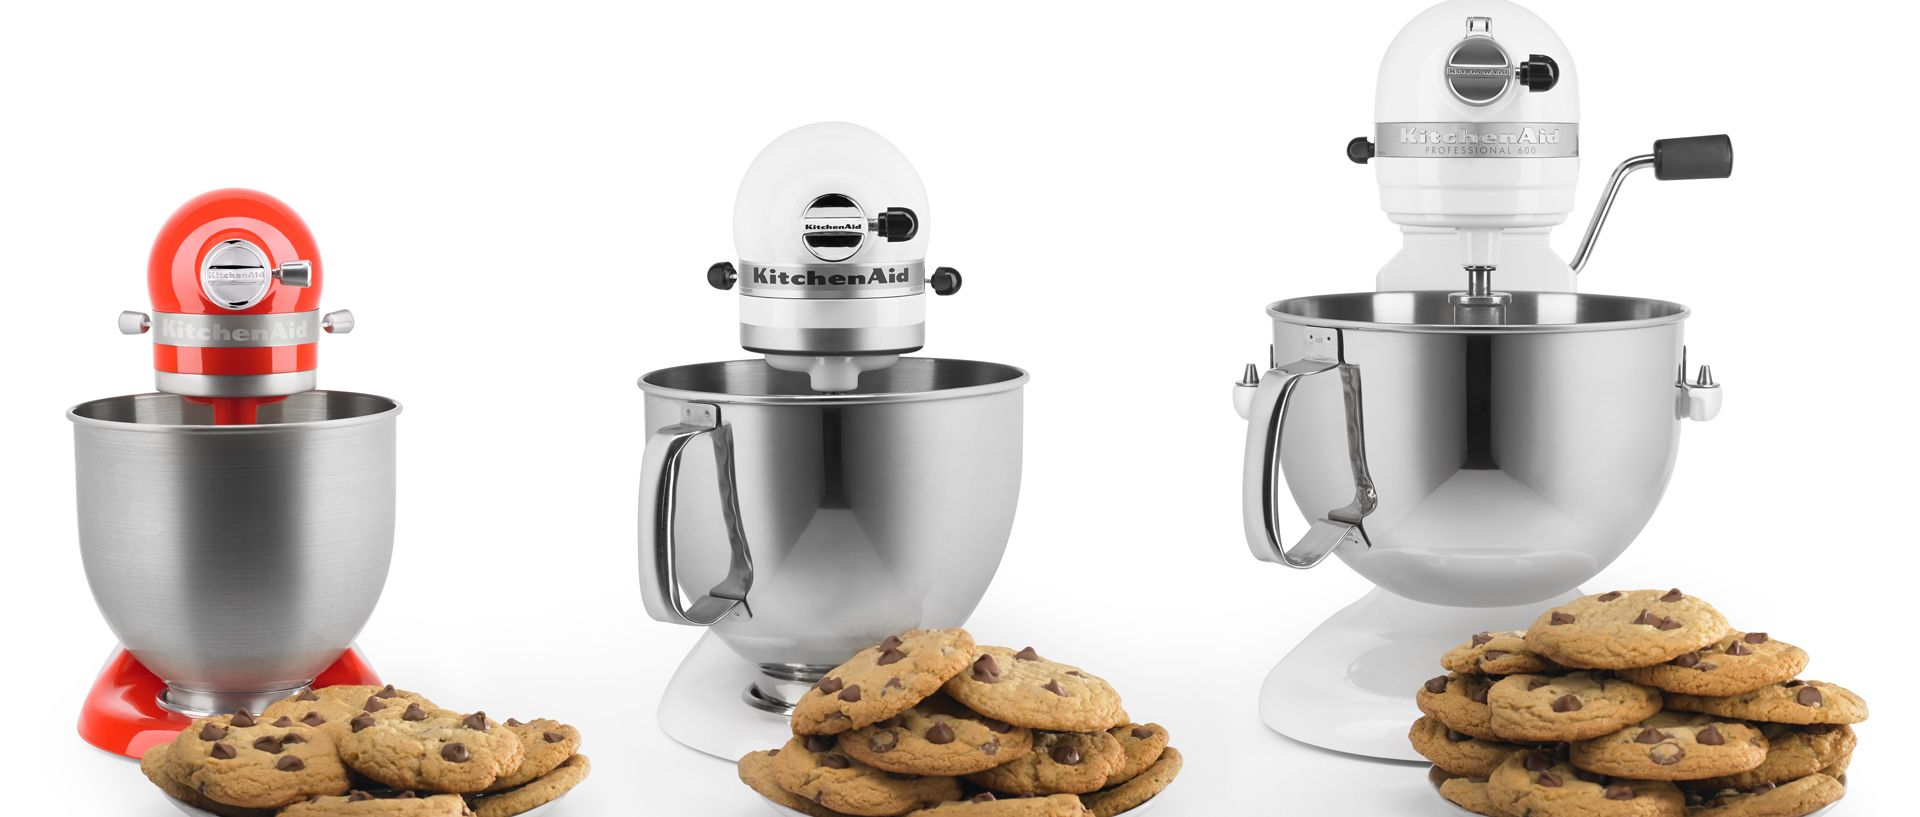 where are kitchenaid small appliances made